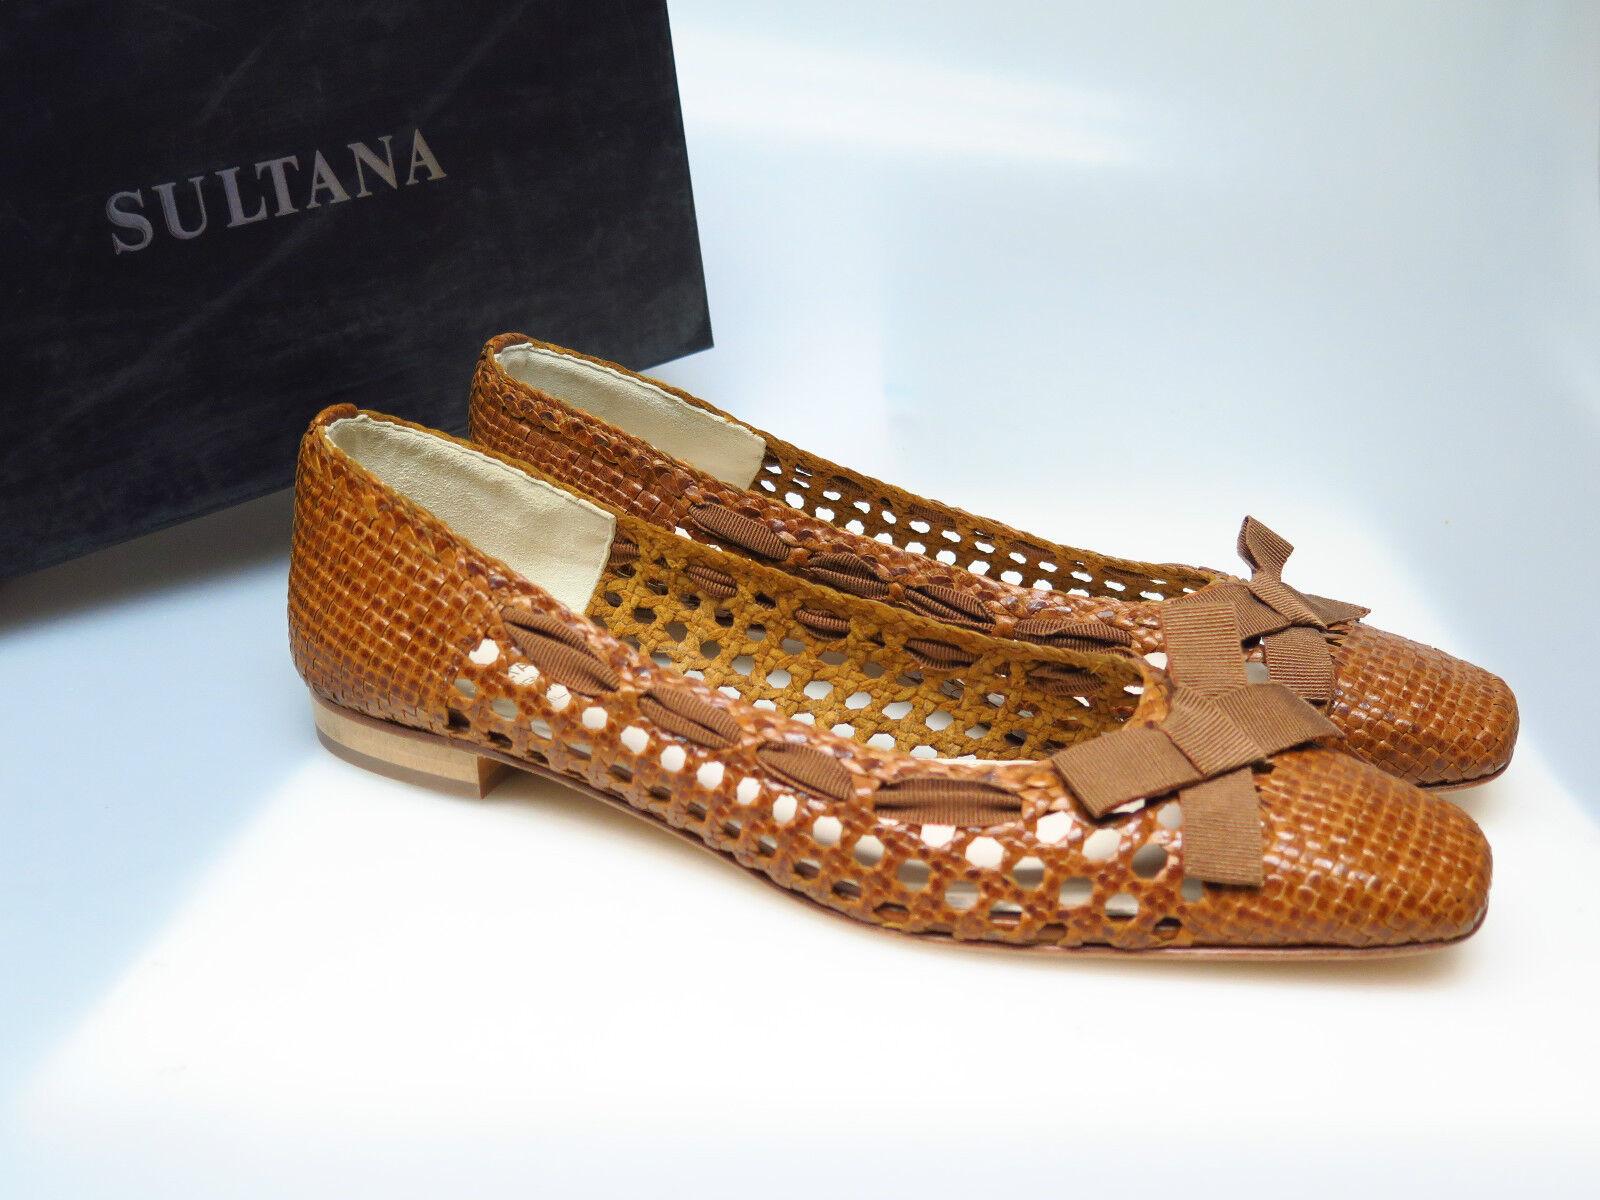 SULTANA Schuhe Designer Damenschuhe N3013 Tati Intreccio Oak Flecht Gr. 41,5 NEU